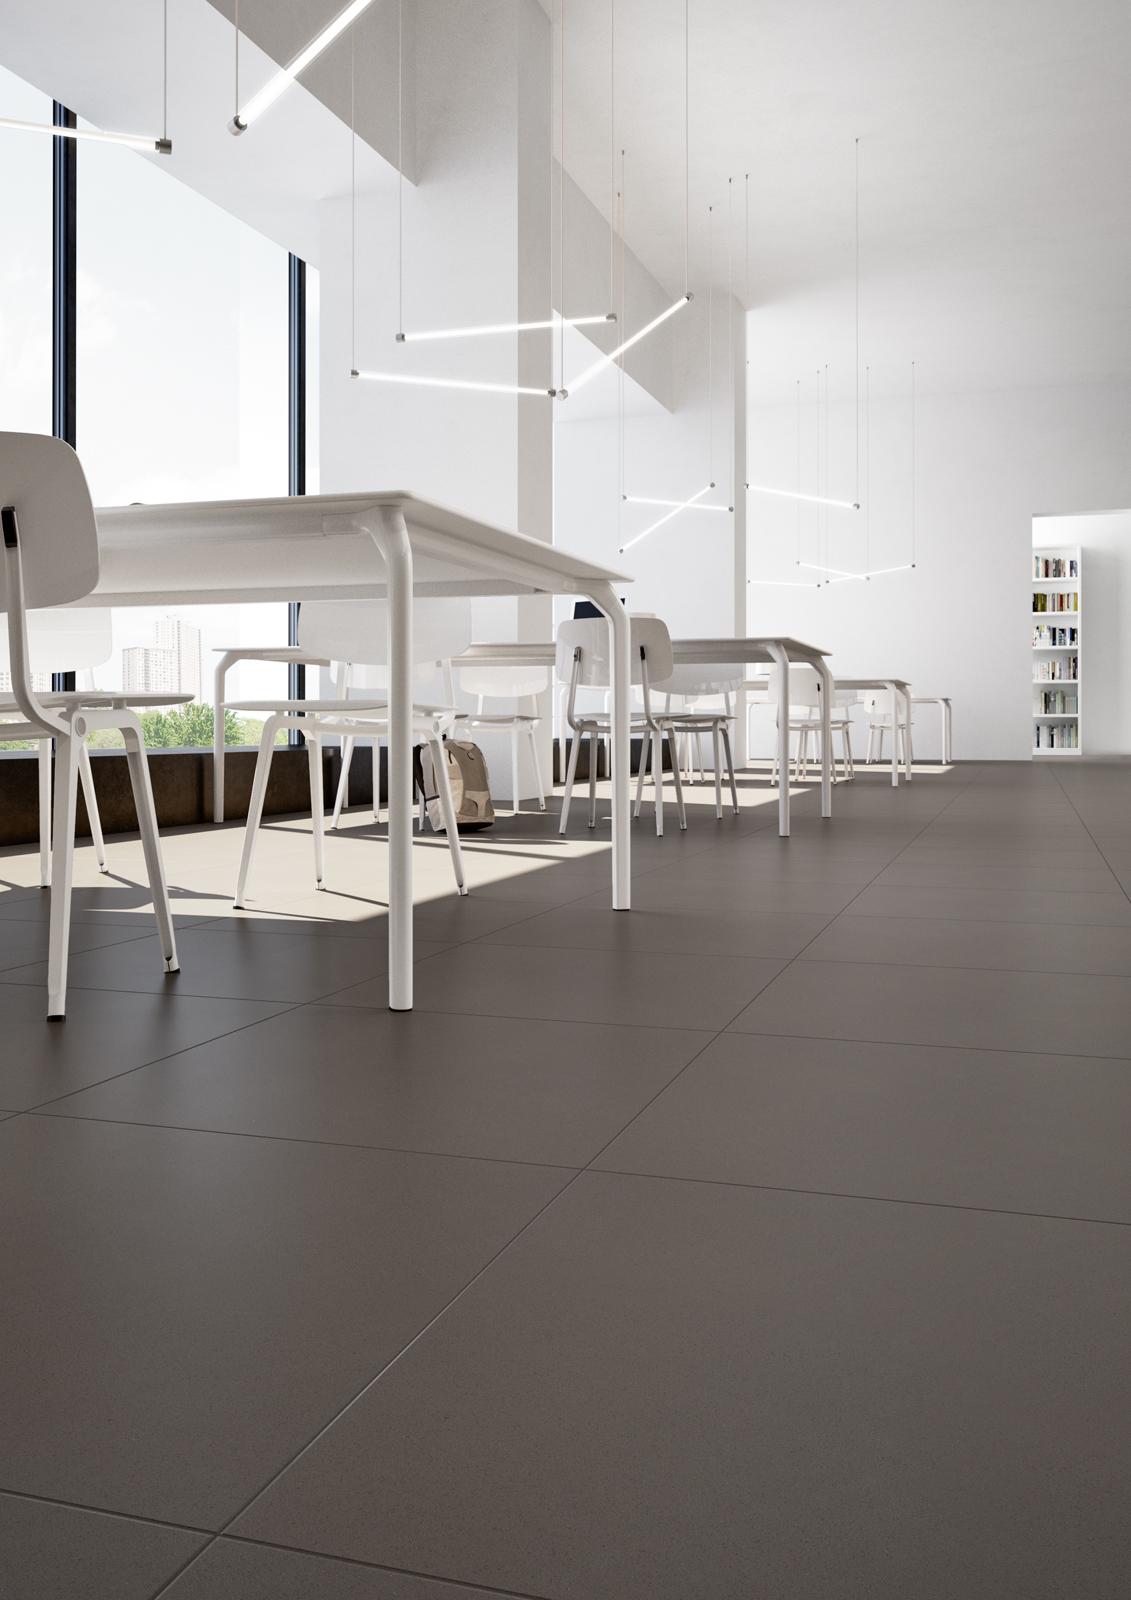 Sistemb gres porcel nico para arquitectura marazzi - Gres porcelanico limpieza ...